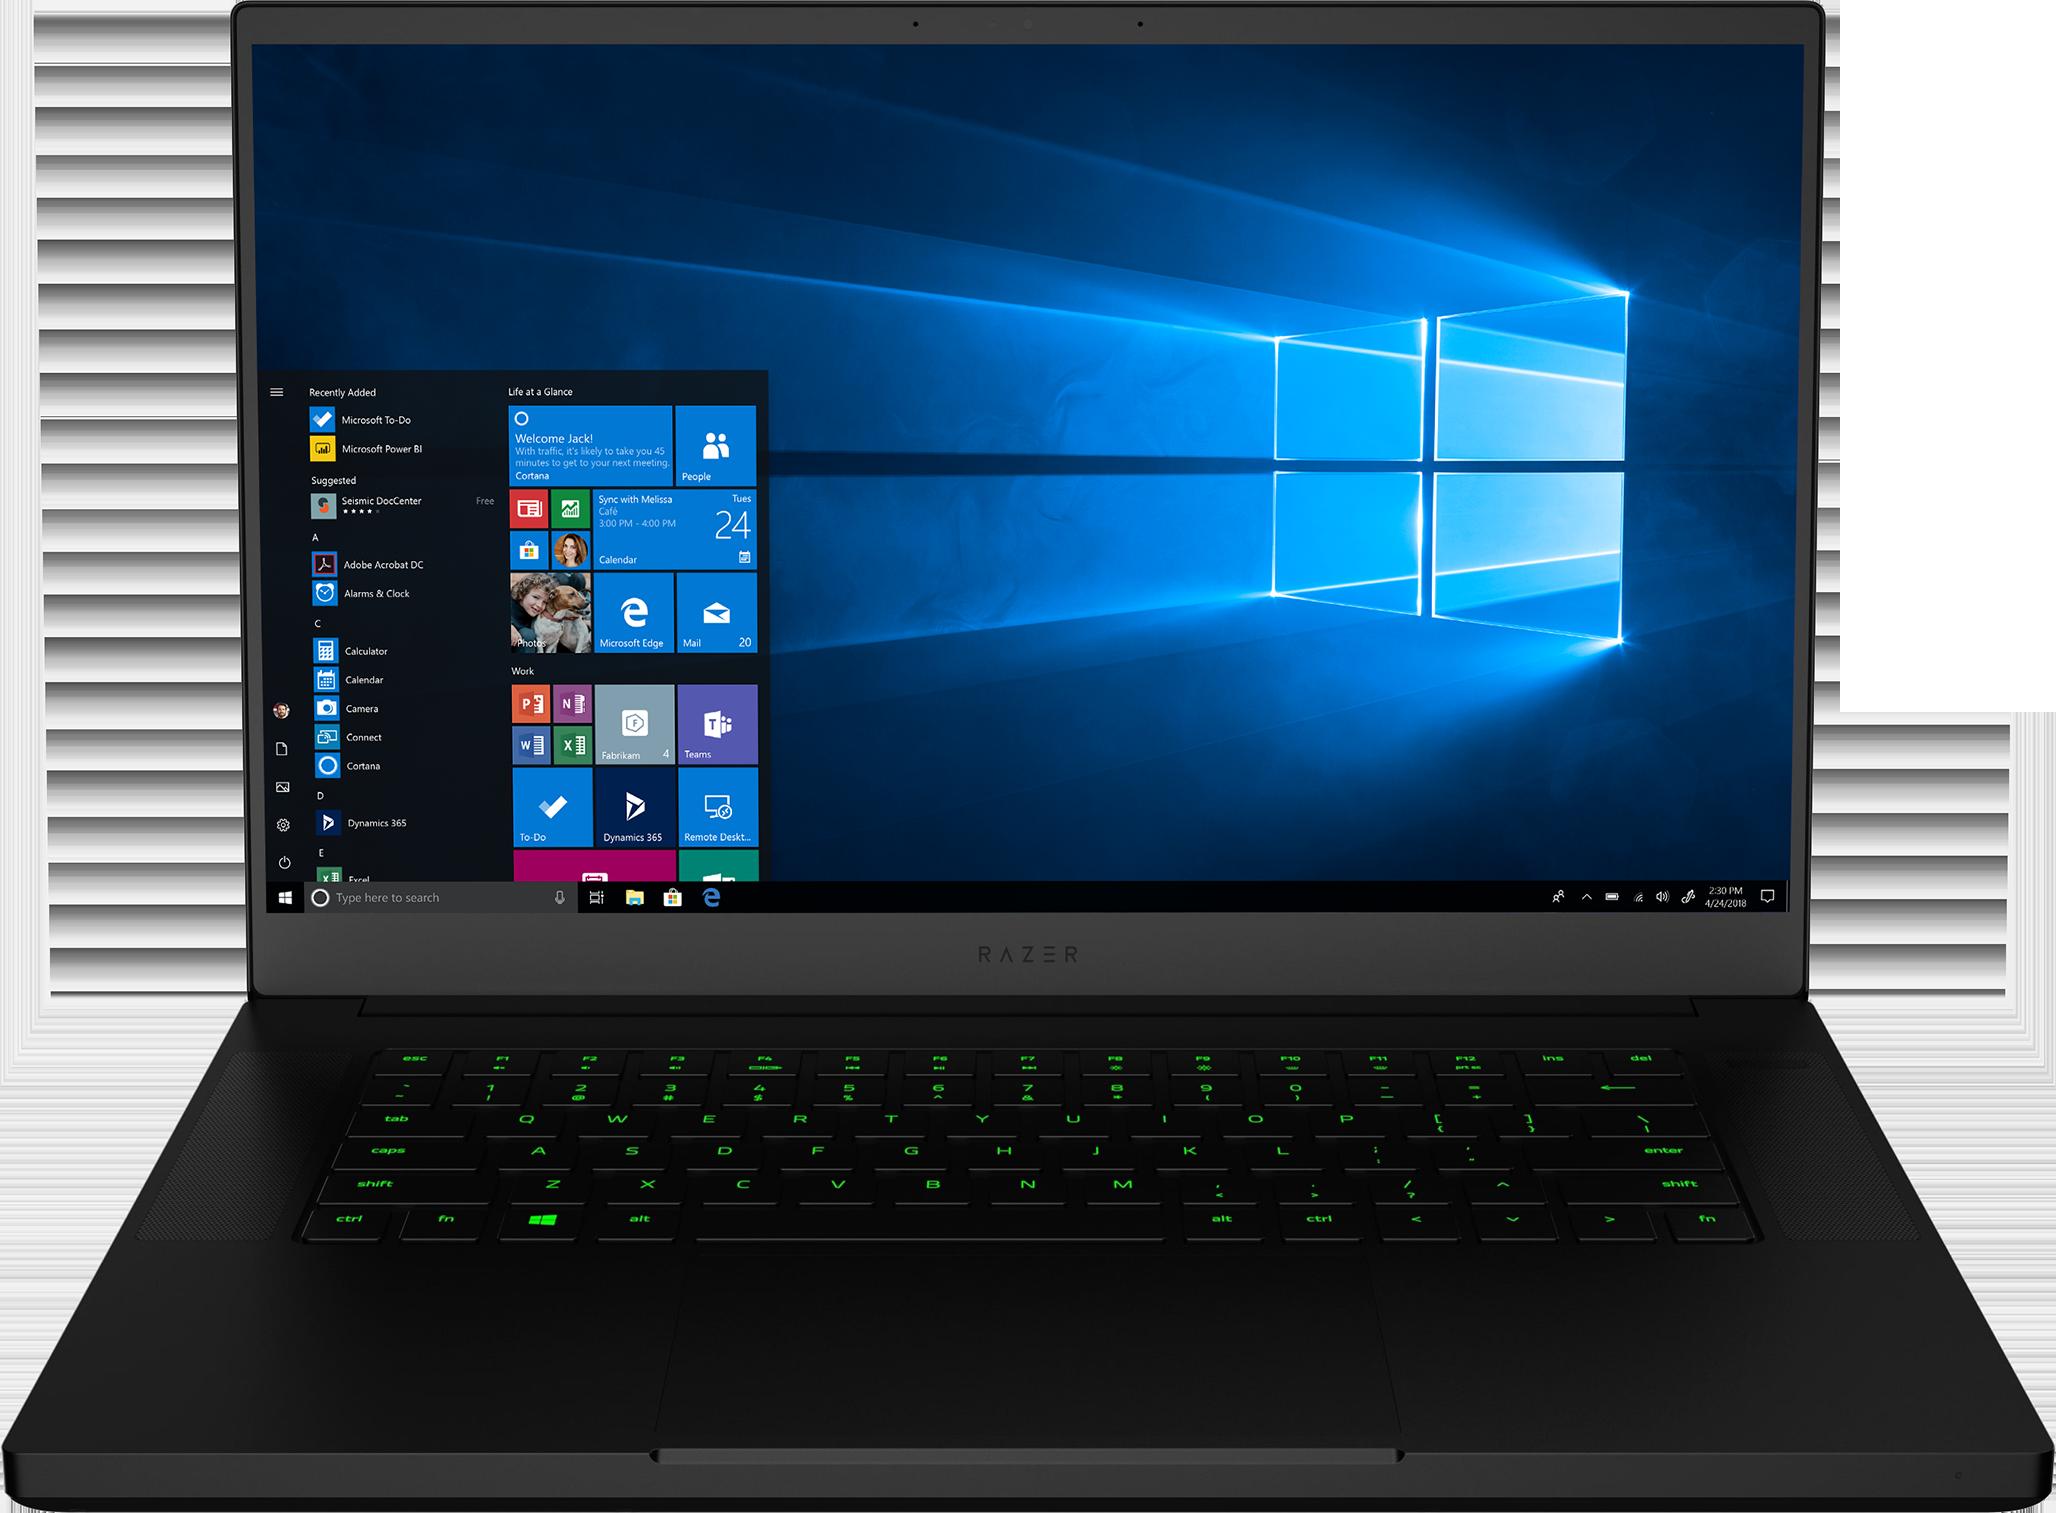 Buy Razer Blade RZ09 2018 Edition Gaming Laptop - Microsoft